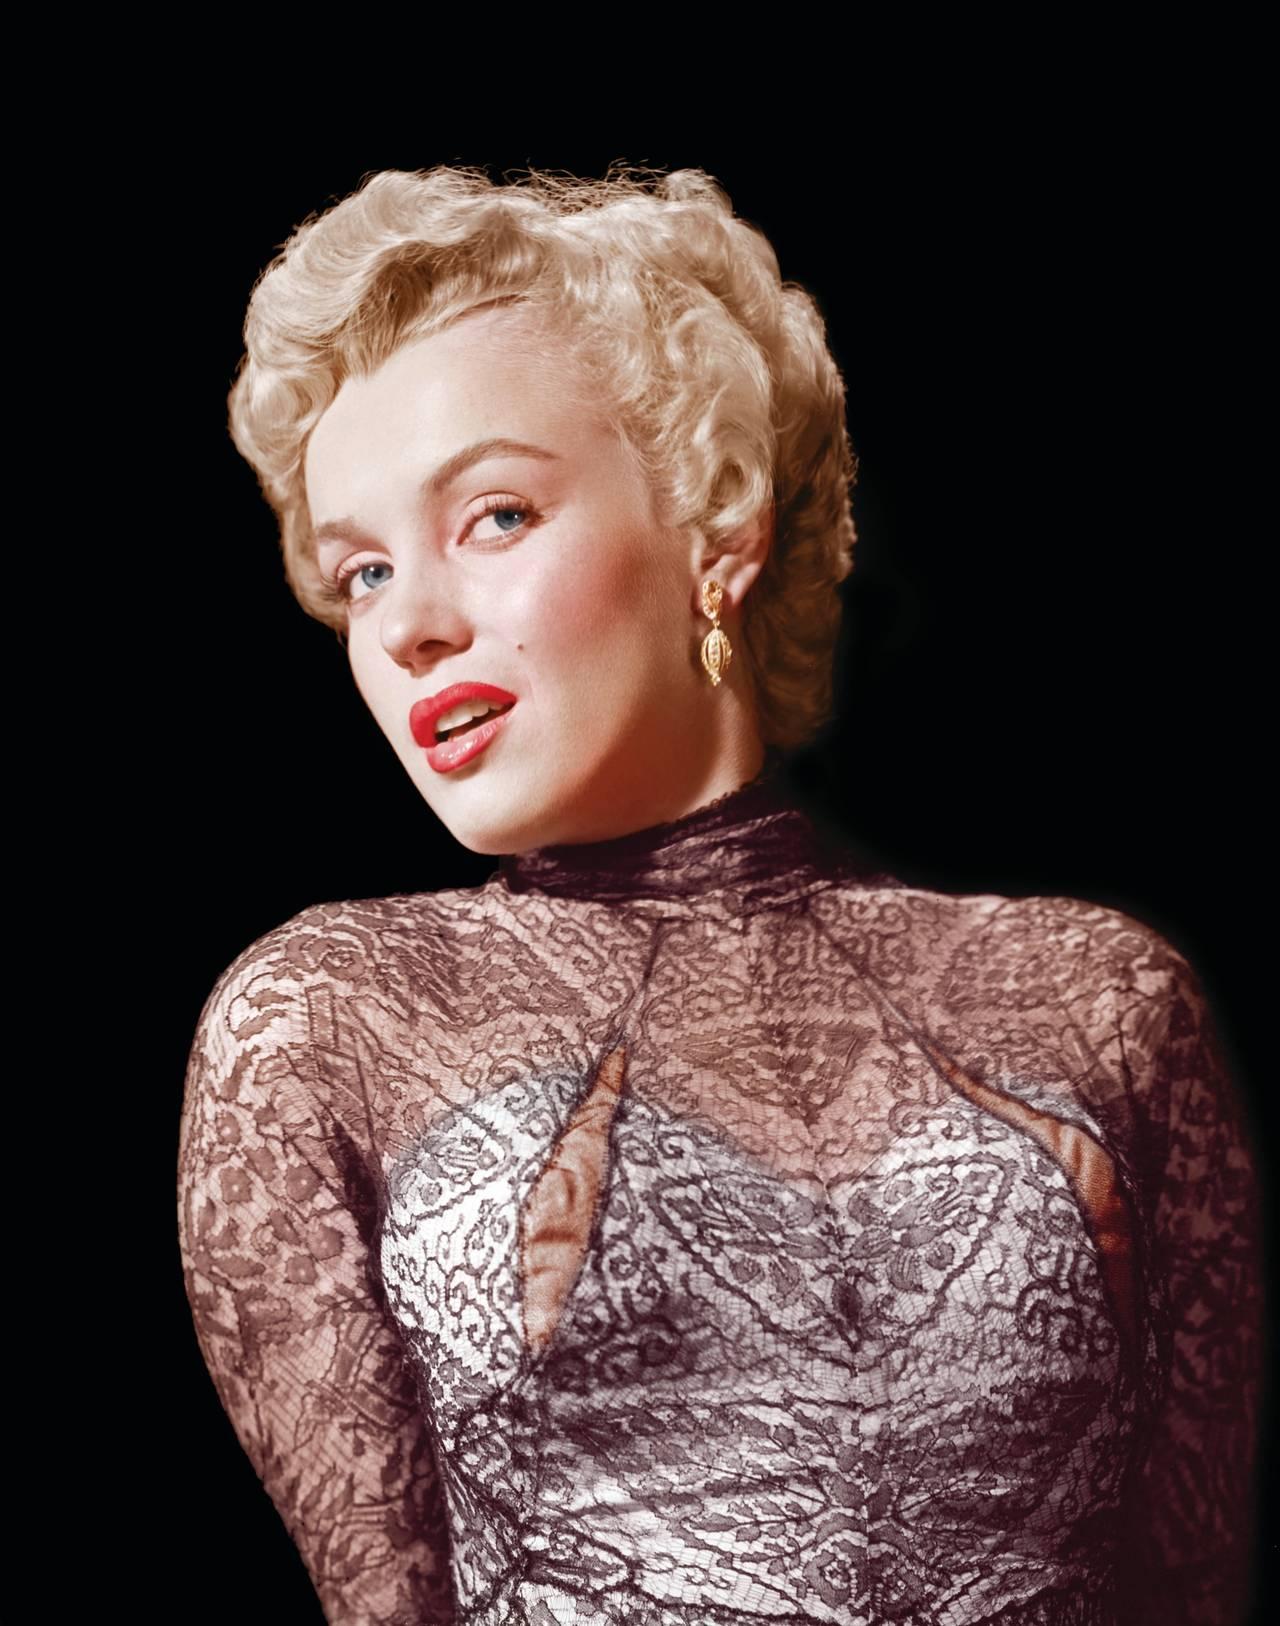 Ernest Bachrach Marilyn Monroe Rare Colorized Closeup Fine Art